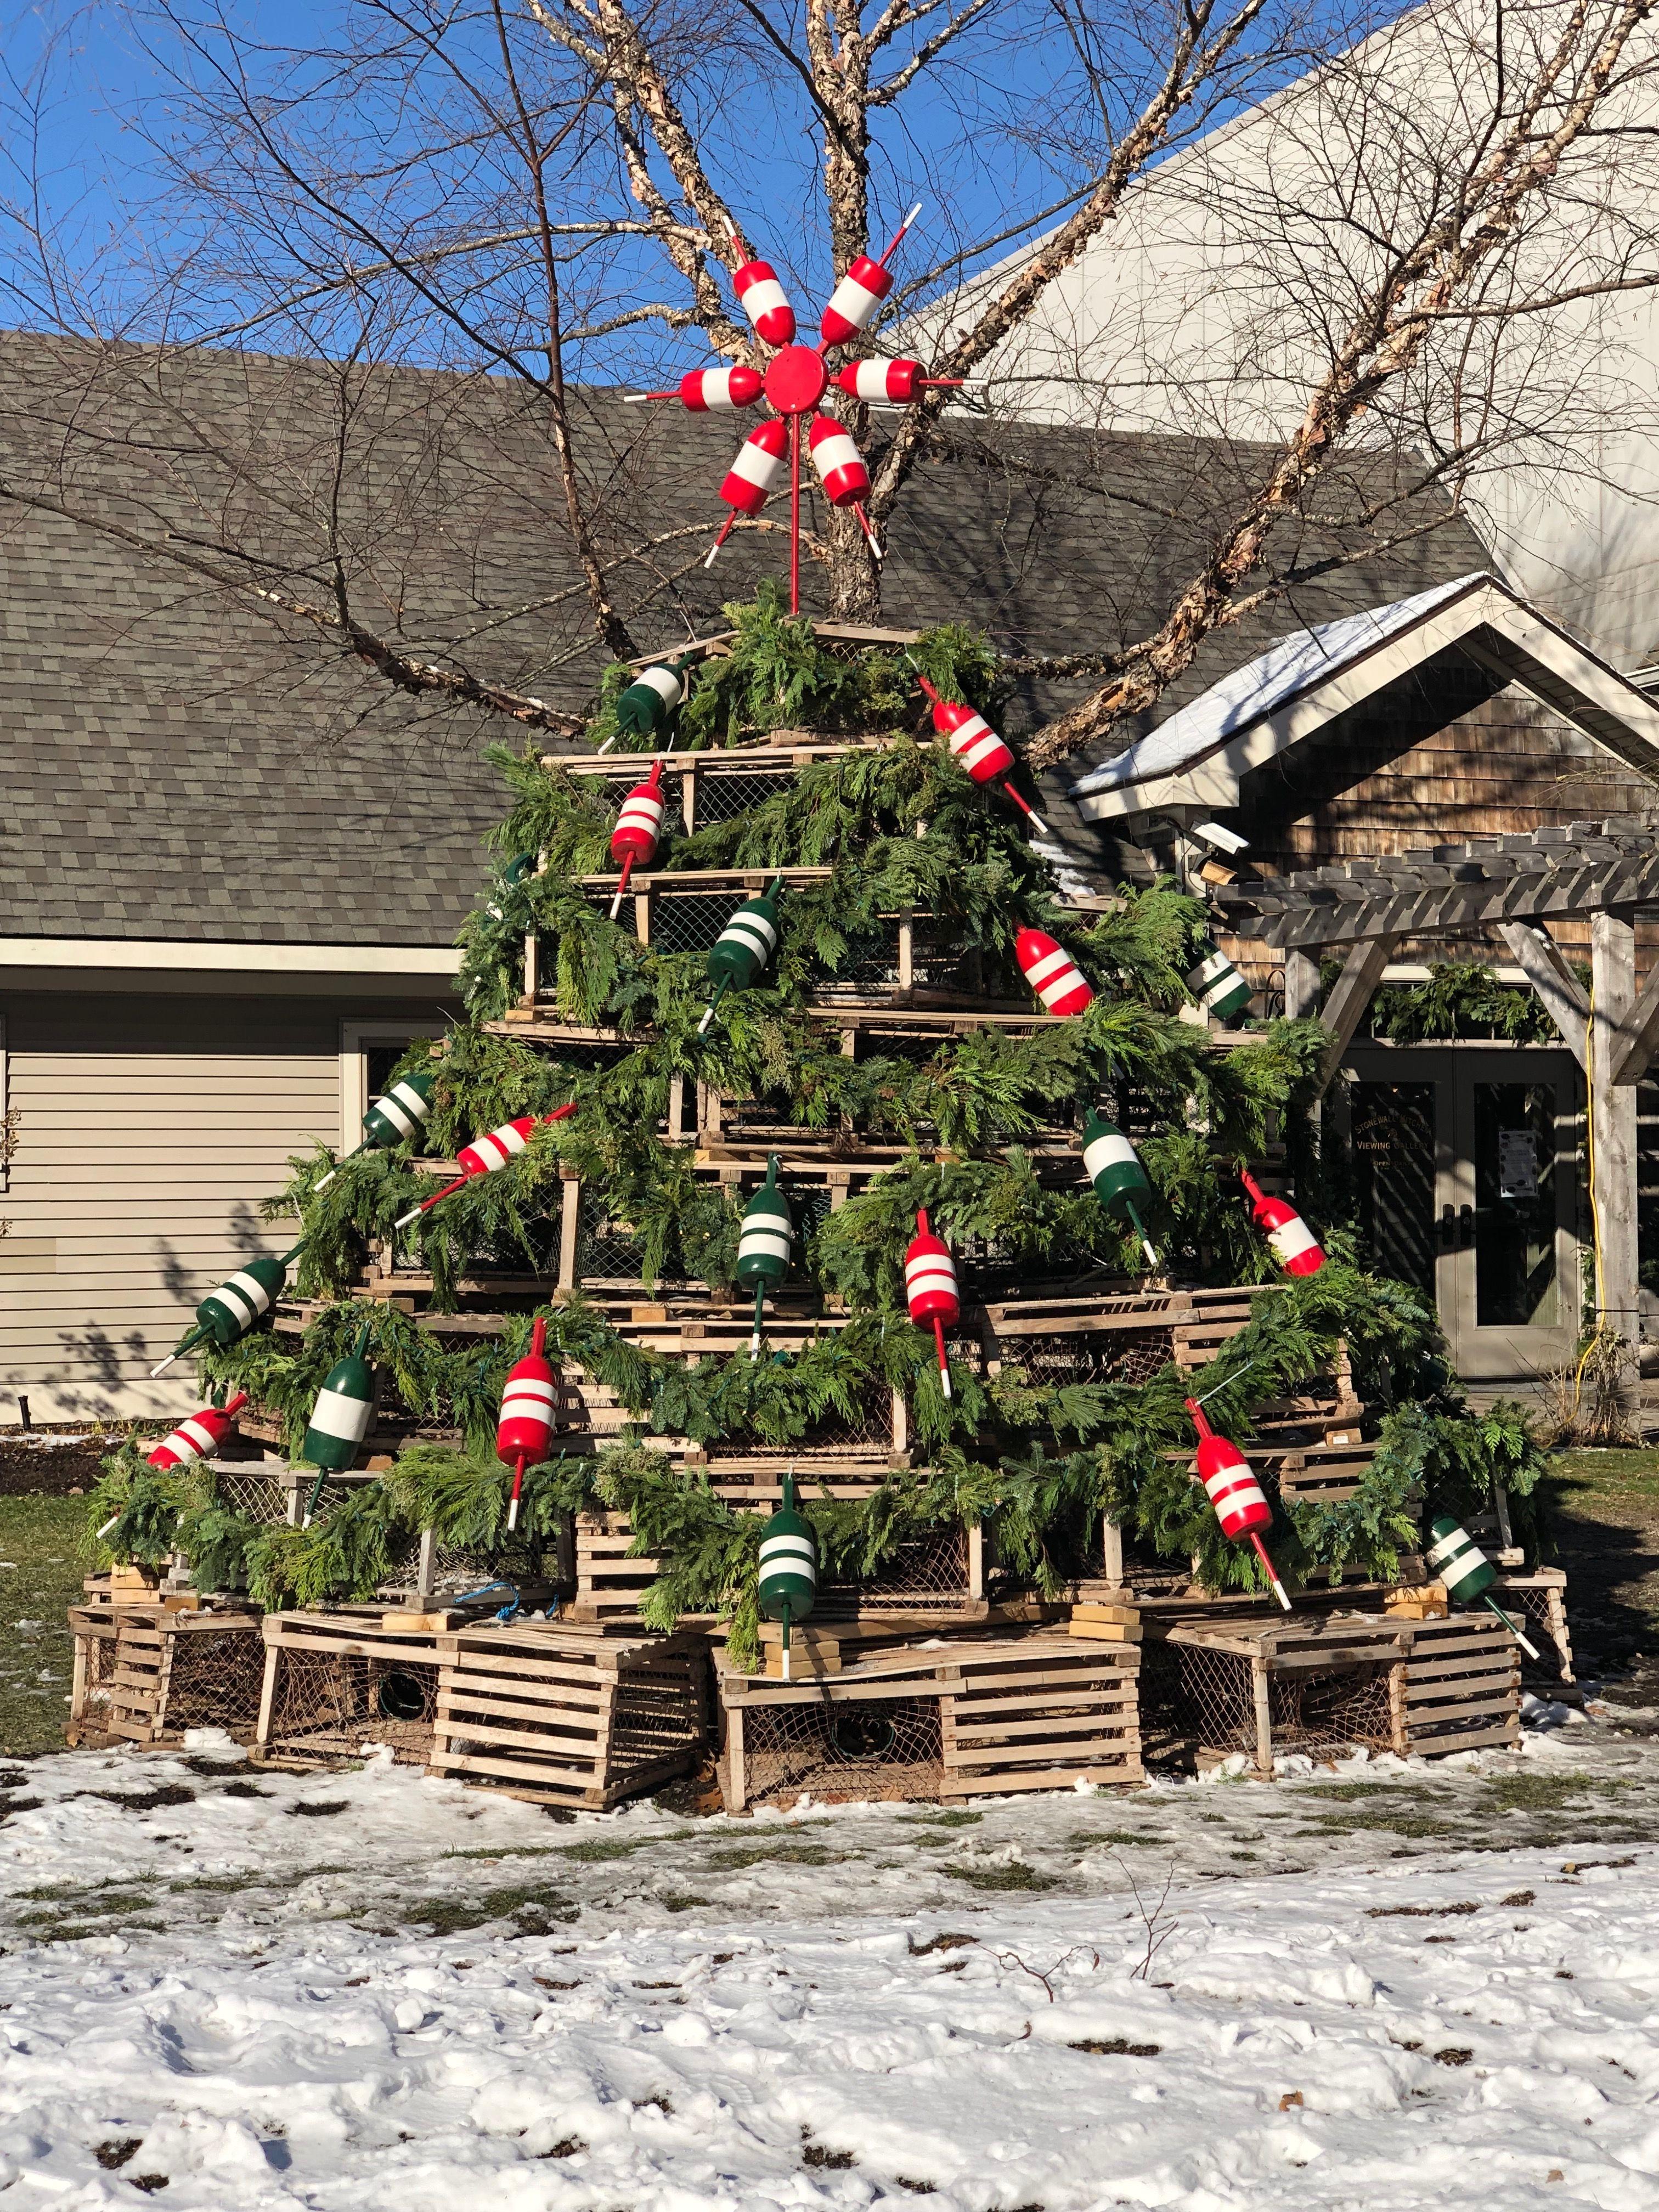 Stonewall Kitchen Maine Christmas Decorations Holiday Decor Christmas Tree